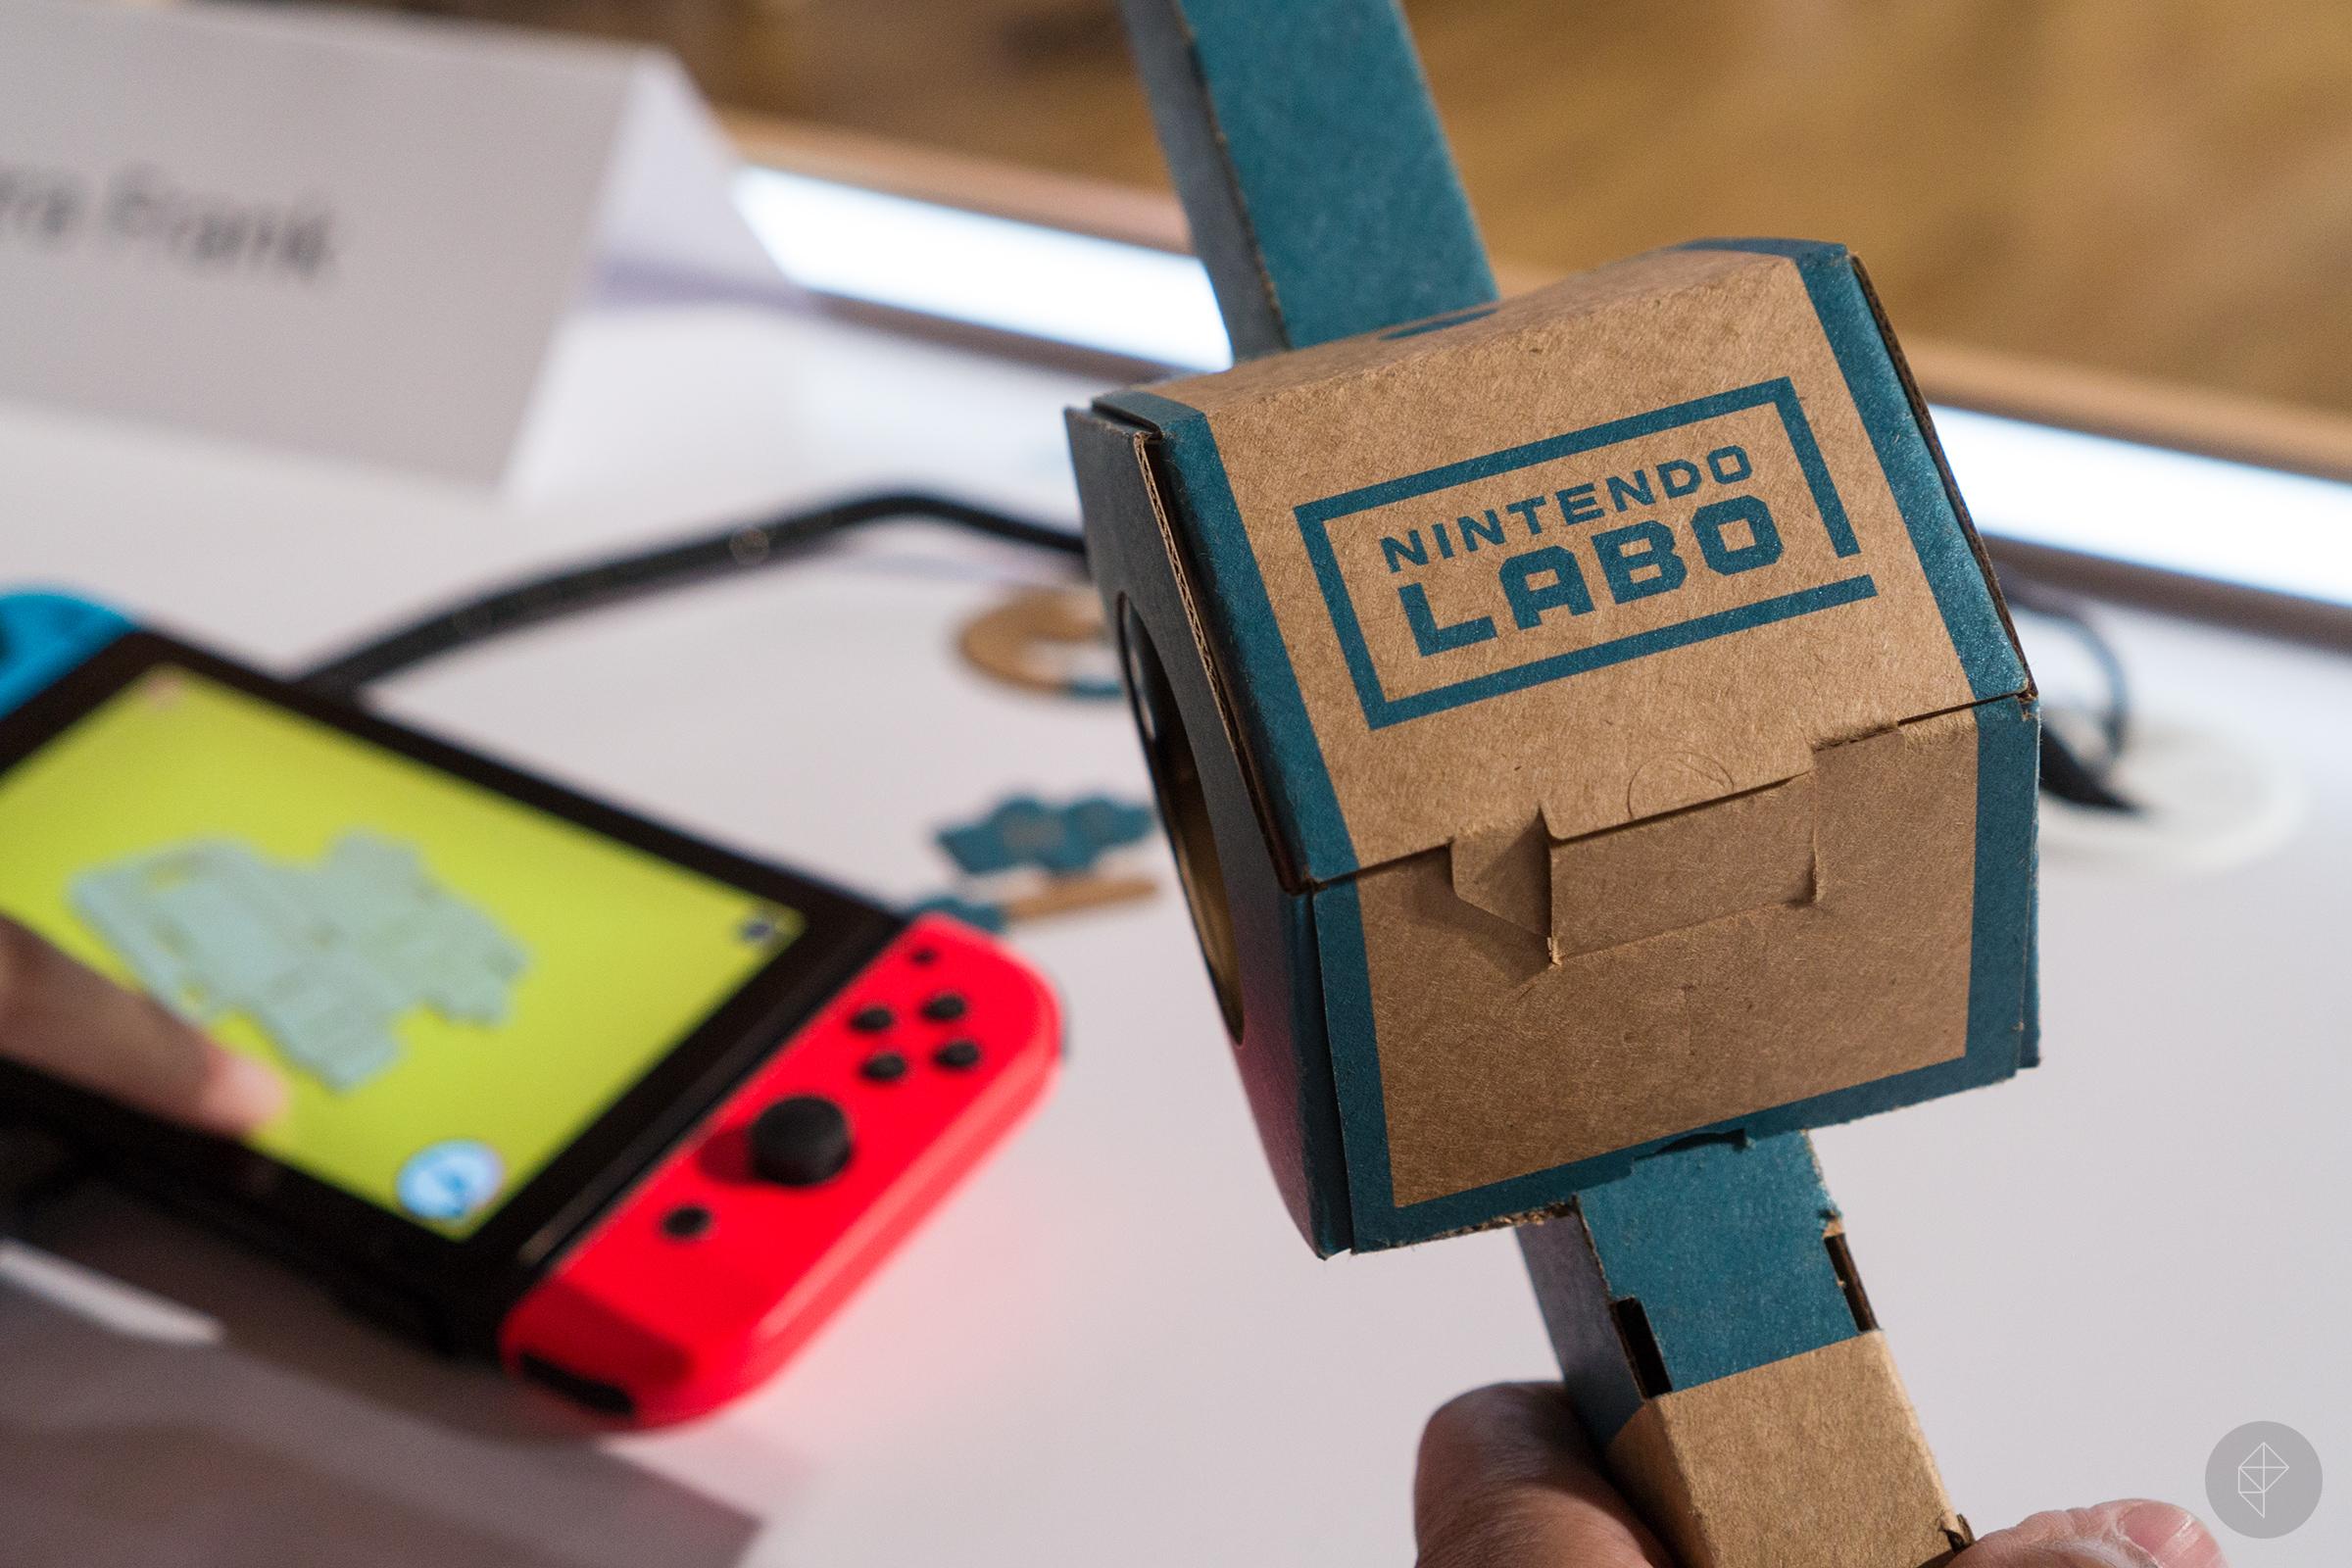 Nintendo Labo - terminate-up of fishing reel underneath building